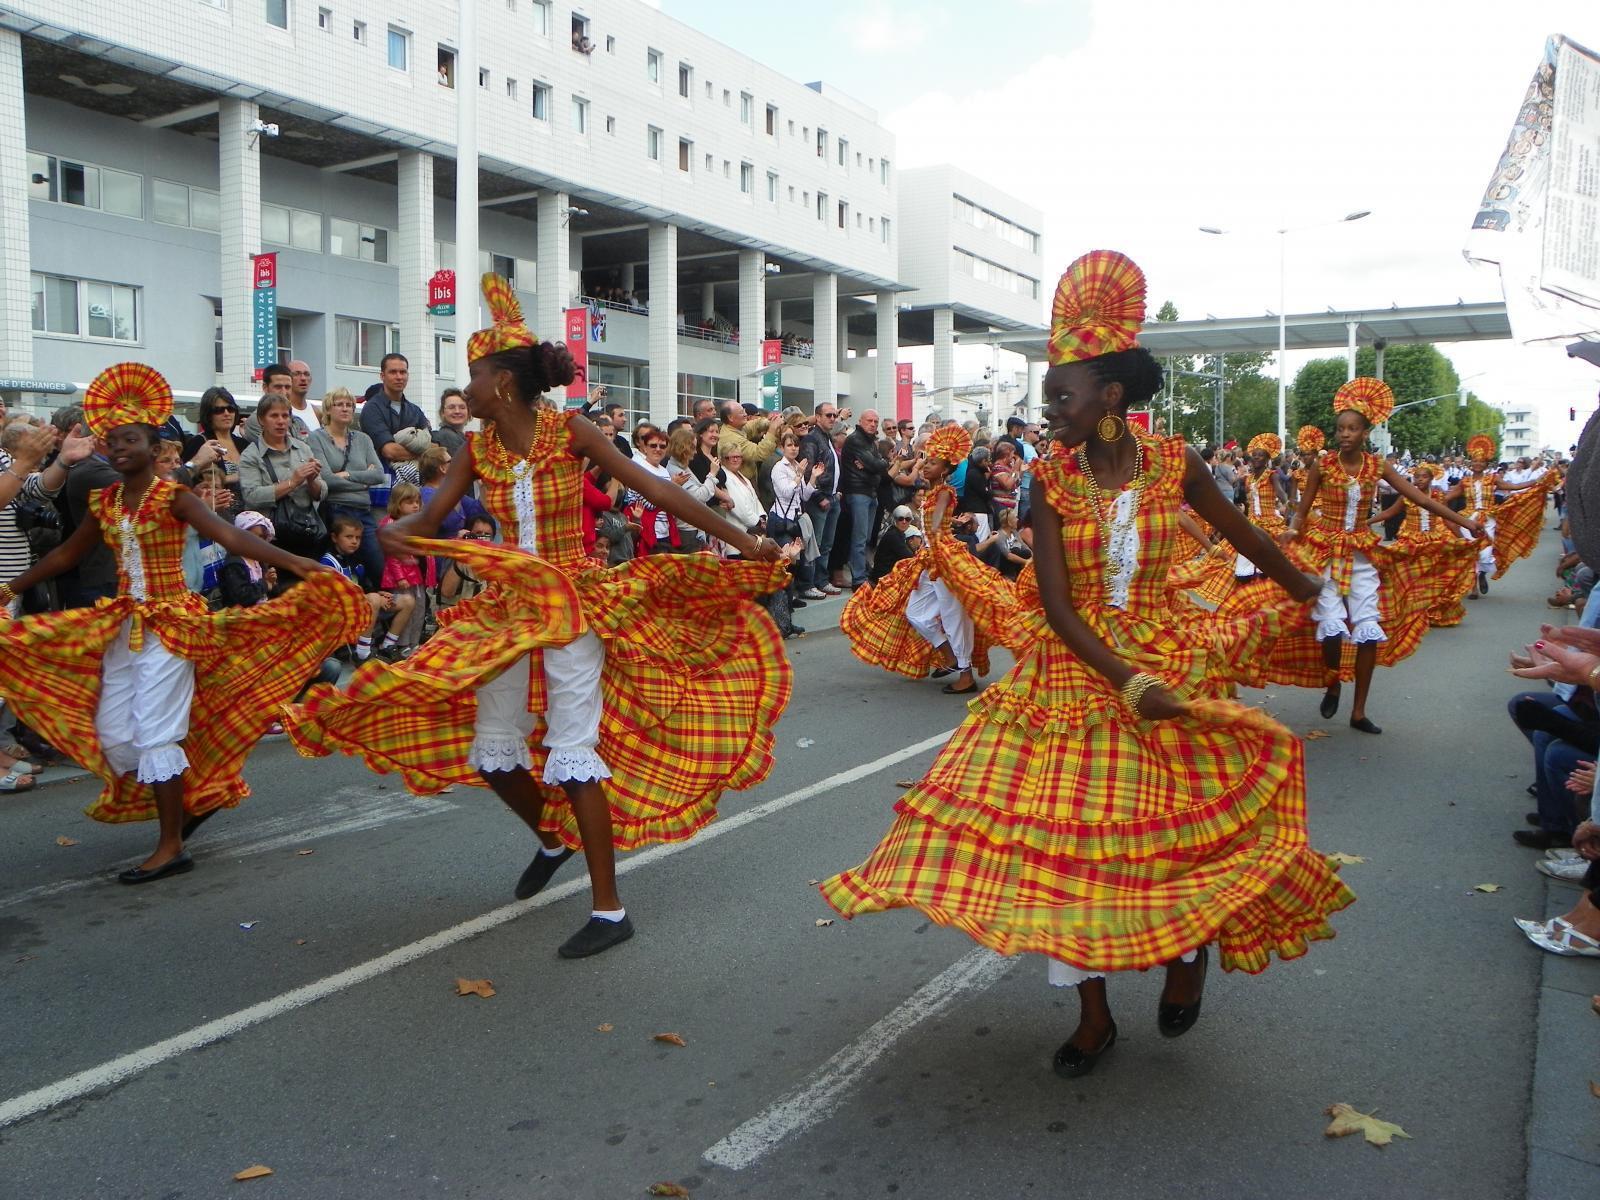 Festival interceltique